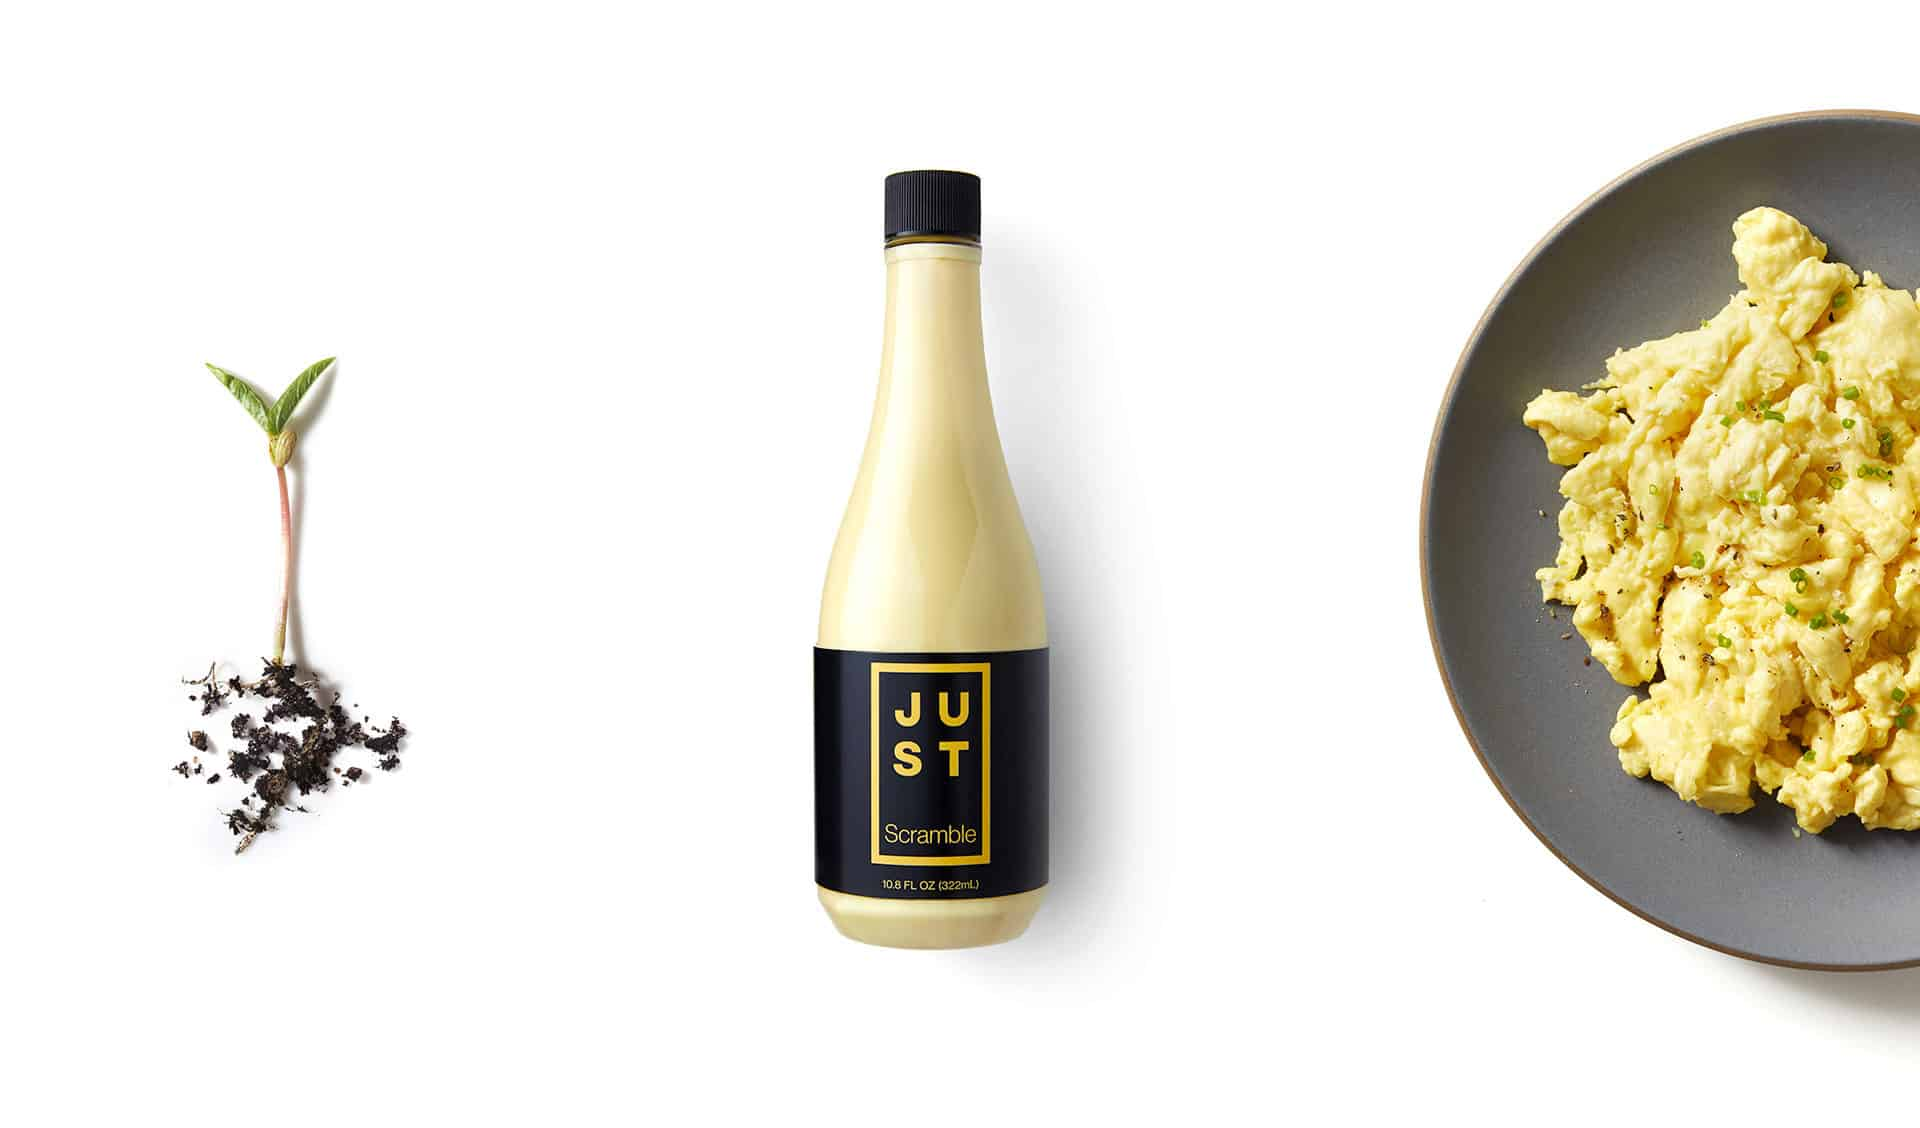 Josh Tetrick's newest plant based food, vegan eggs called JUST Scramble